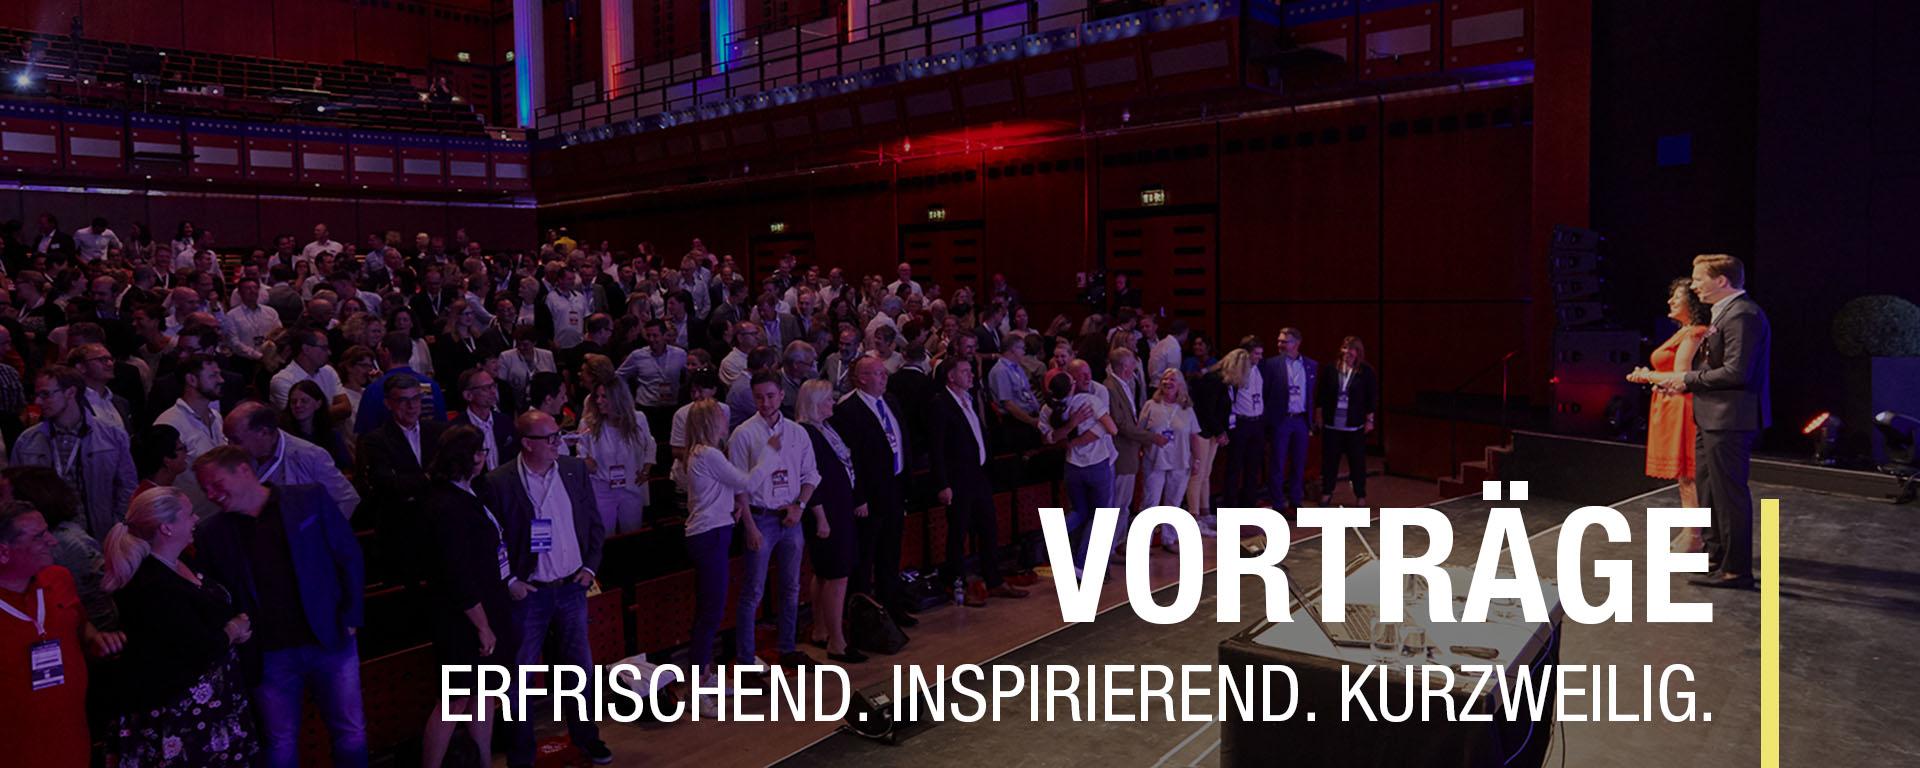 Vortrag, Keynote, Keynotespeaker Gamchanger, Changemanagenemt, Transformation